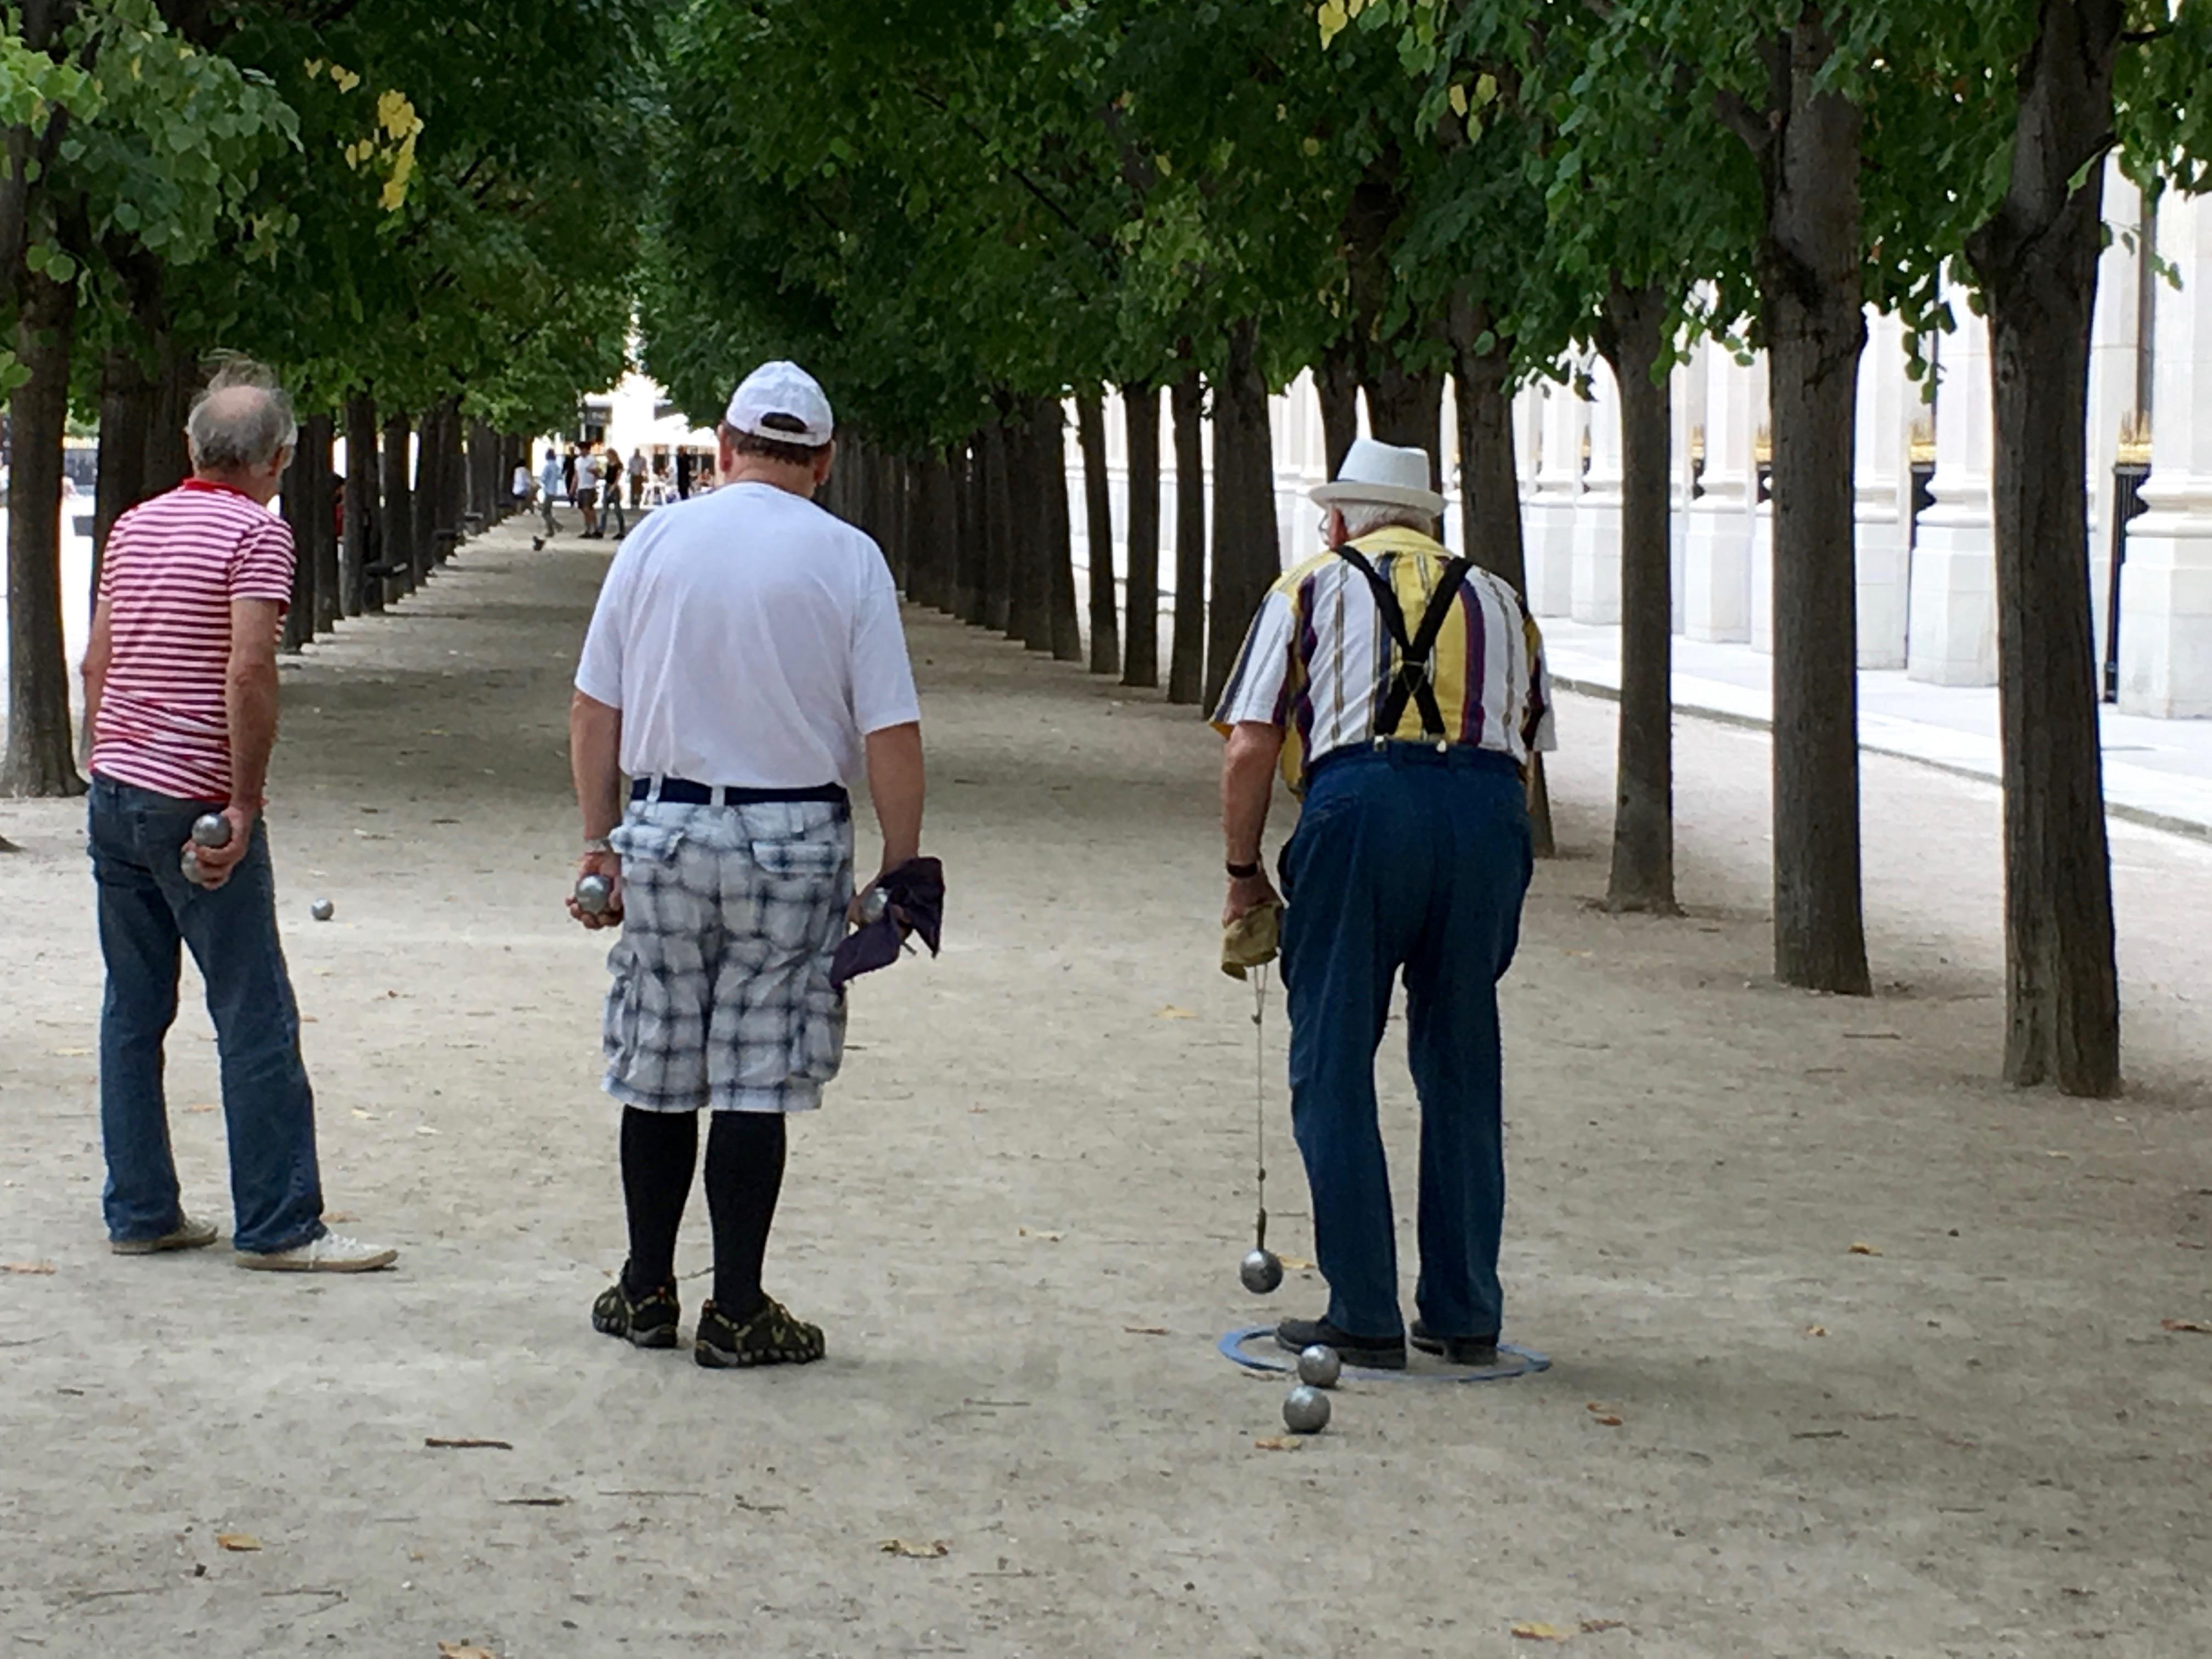 Parisians playing petanque in a park